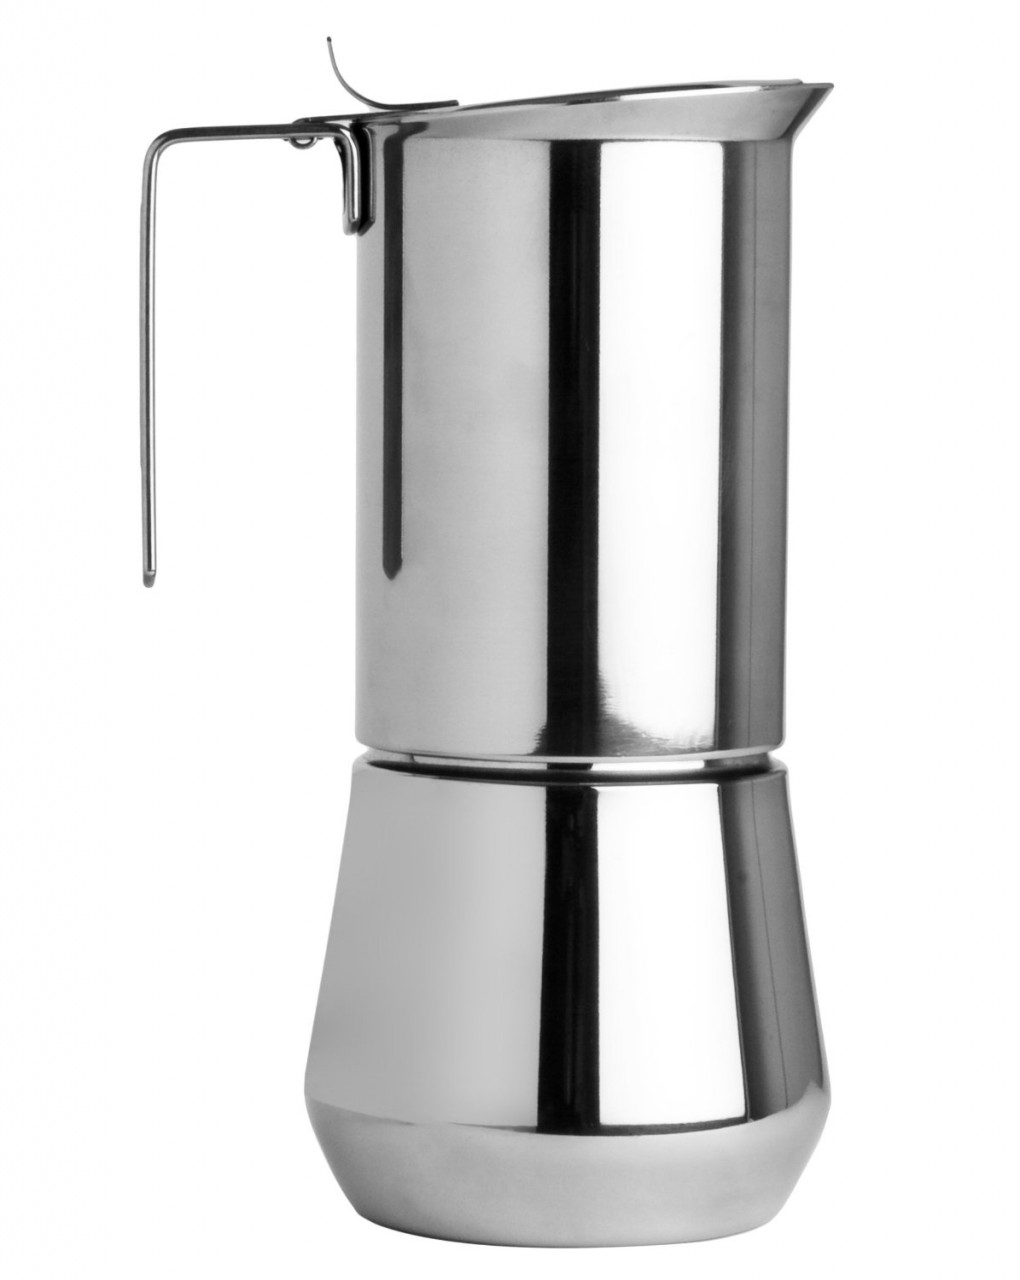 Ilsa Turbo Express Stovetop Espresso Maker 1 cup size